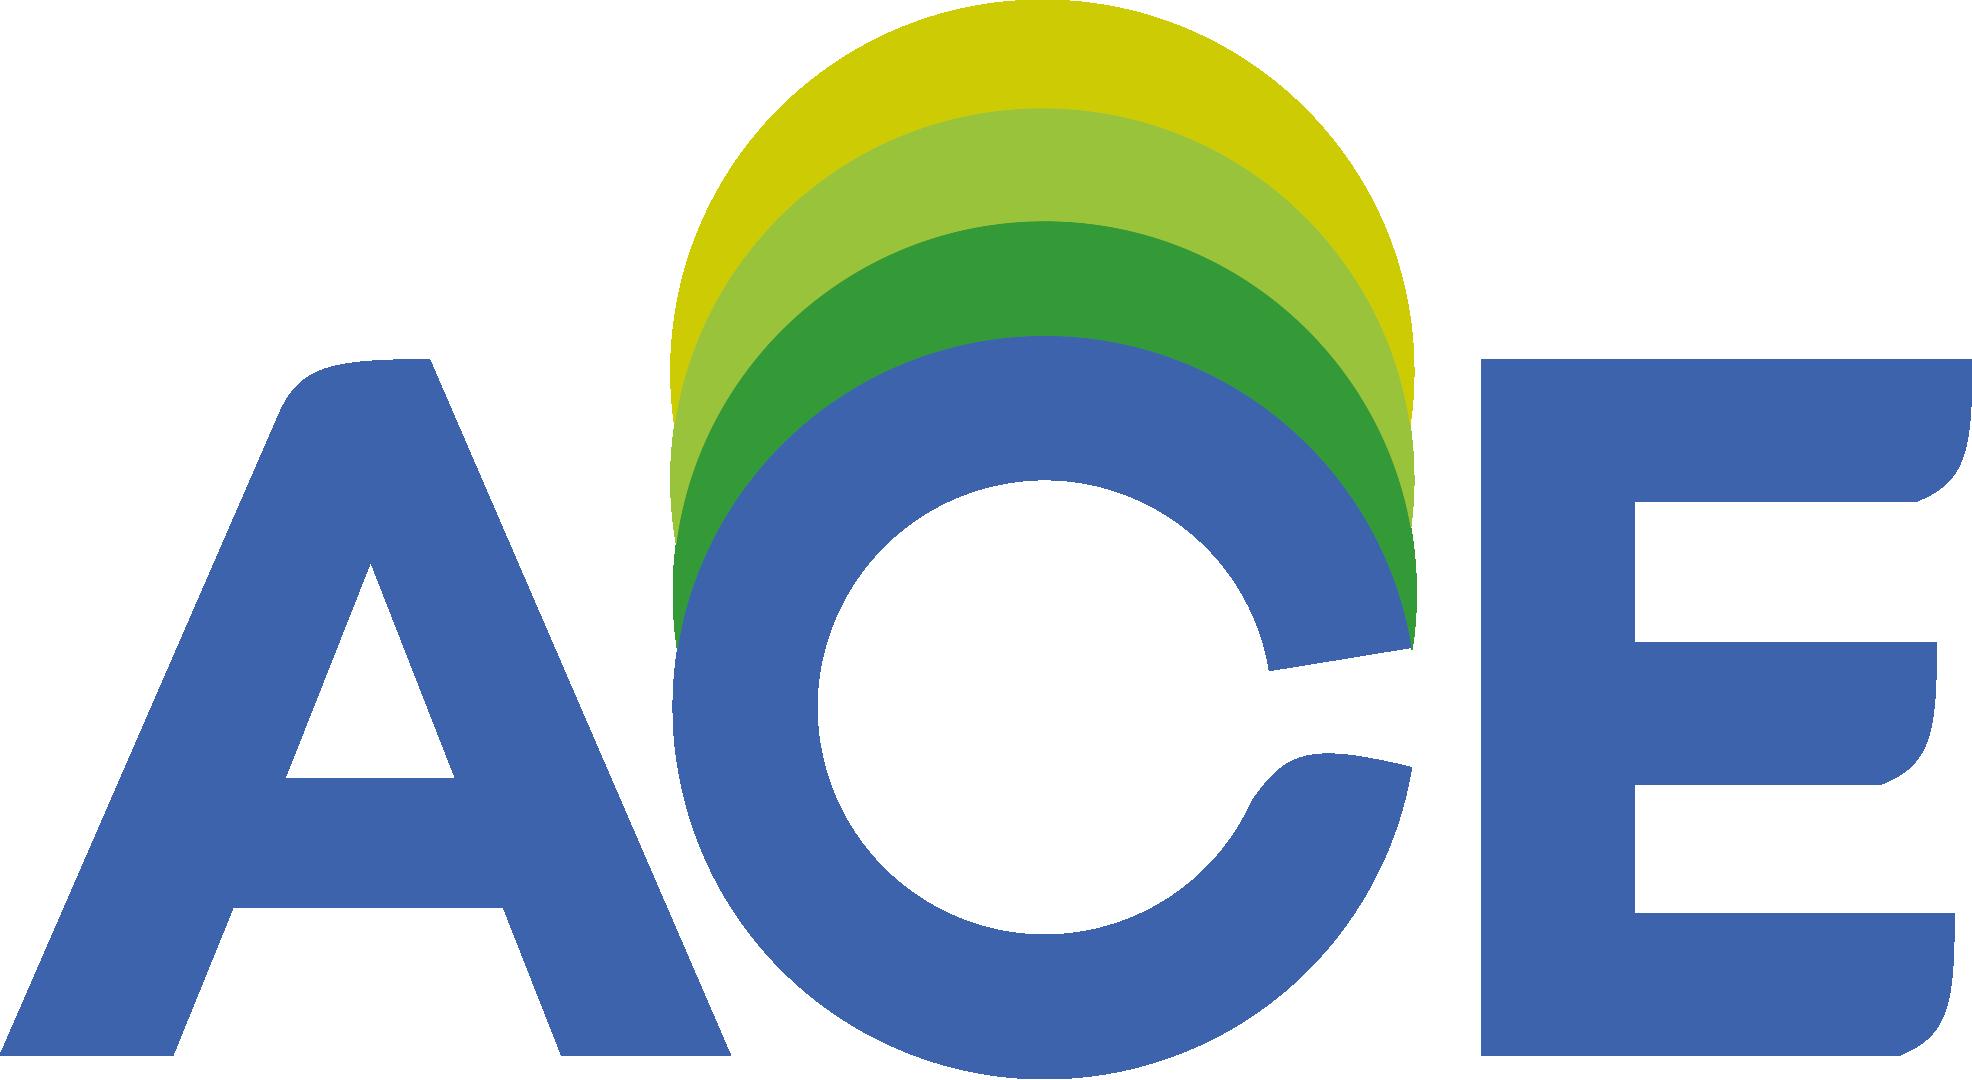 ACE_LOGO_transp